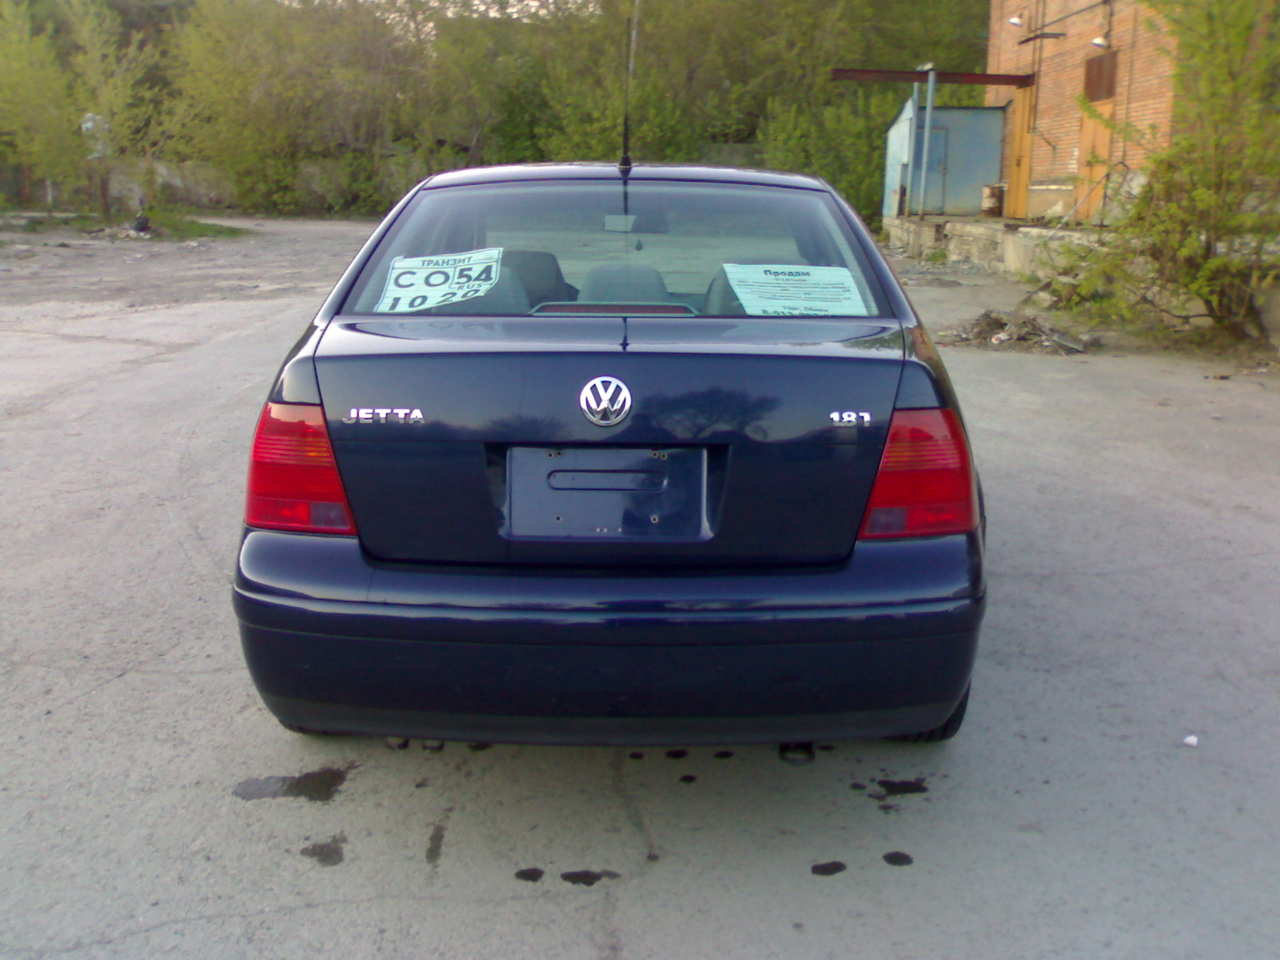 2001 Volkswagen Jetta Photos, 1.8, Gasoline, FF, Automatic For Sale